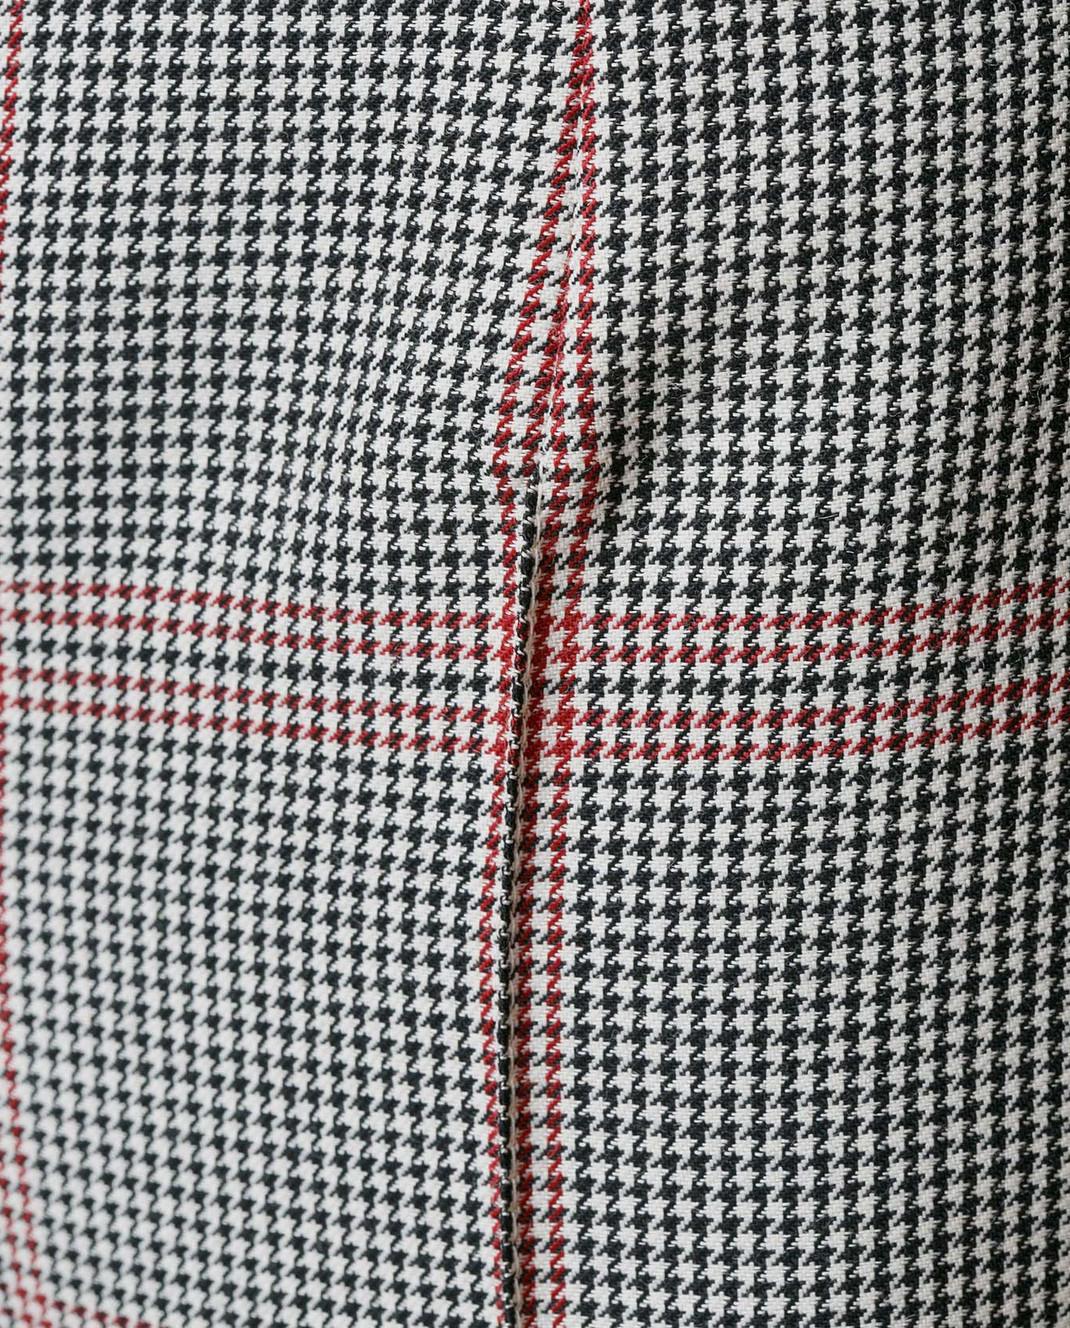 NINA RICCI Серые брюки 17ECPA018WV0211 изображение 5